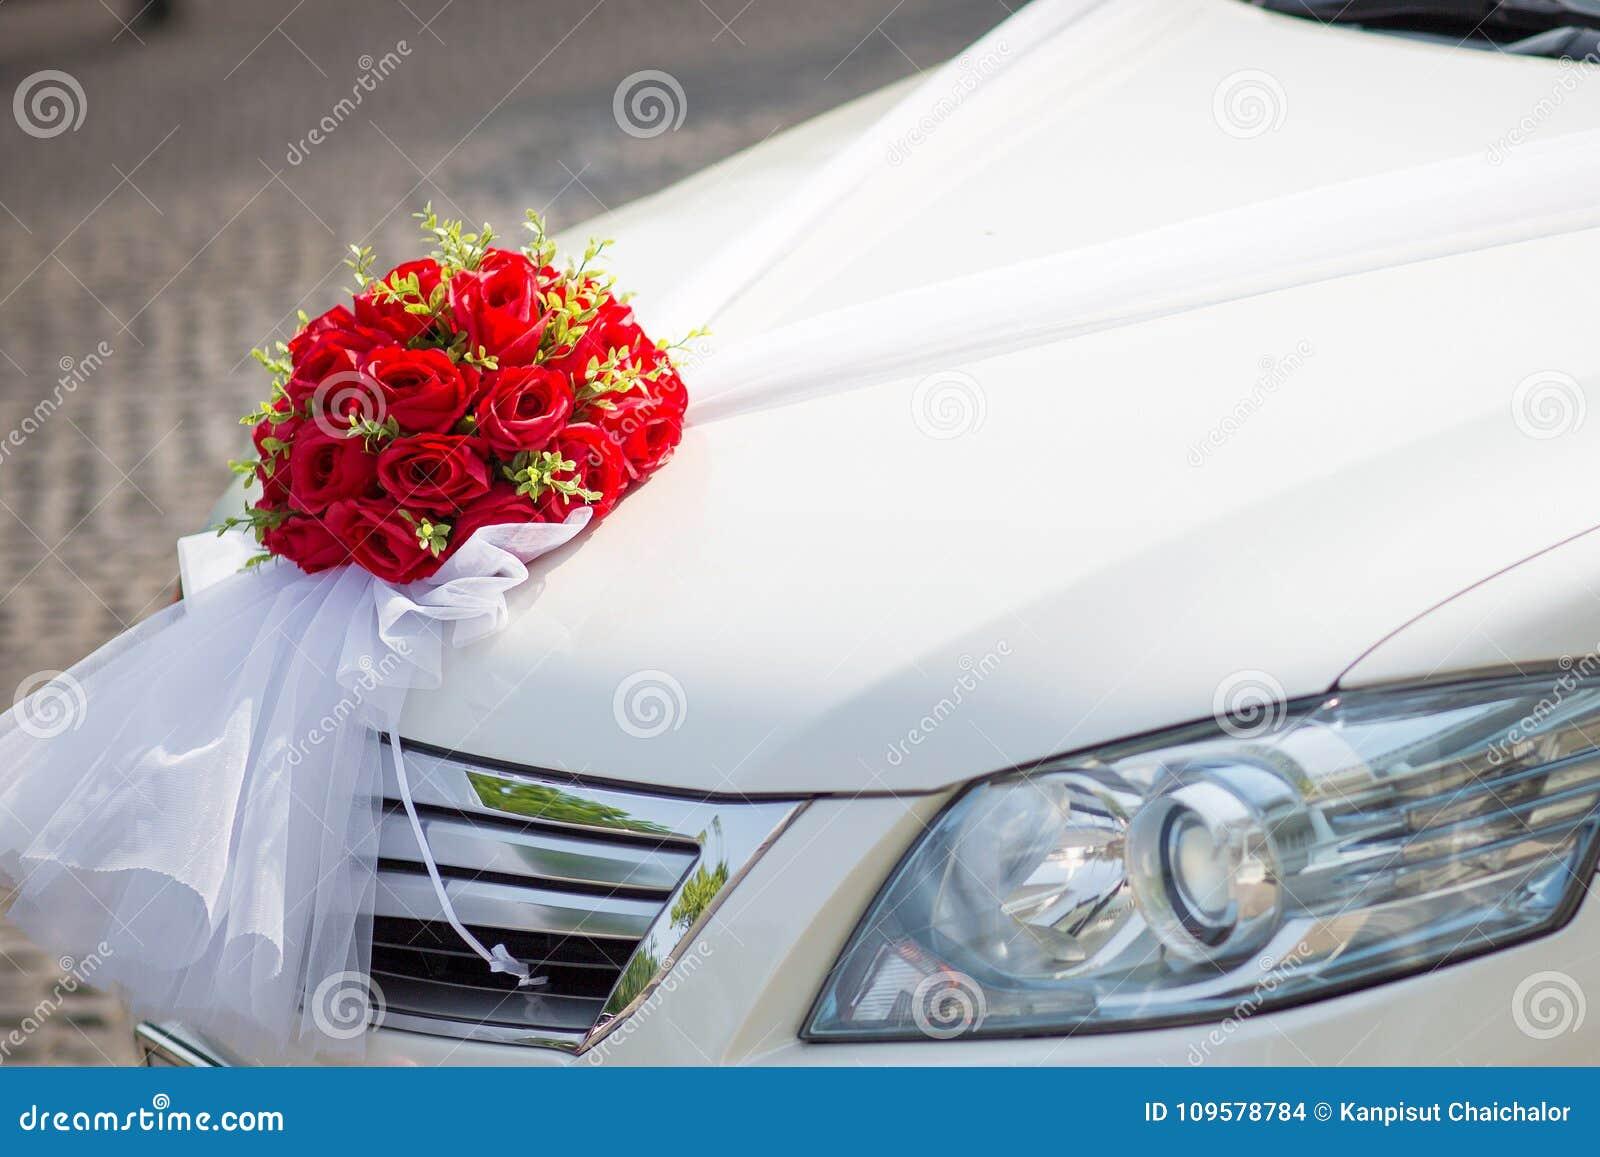 Wedding Car Wedding Decoration On Wedding Car Luxury Wedding Car Decorated With Flowers Stock Photo Image Of Light Anniversary 109578784